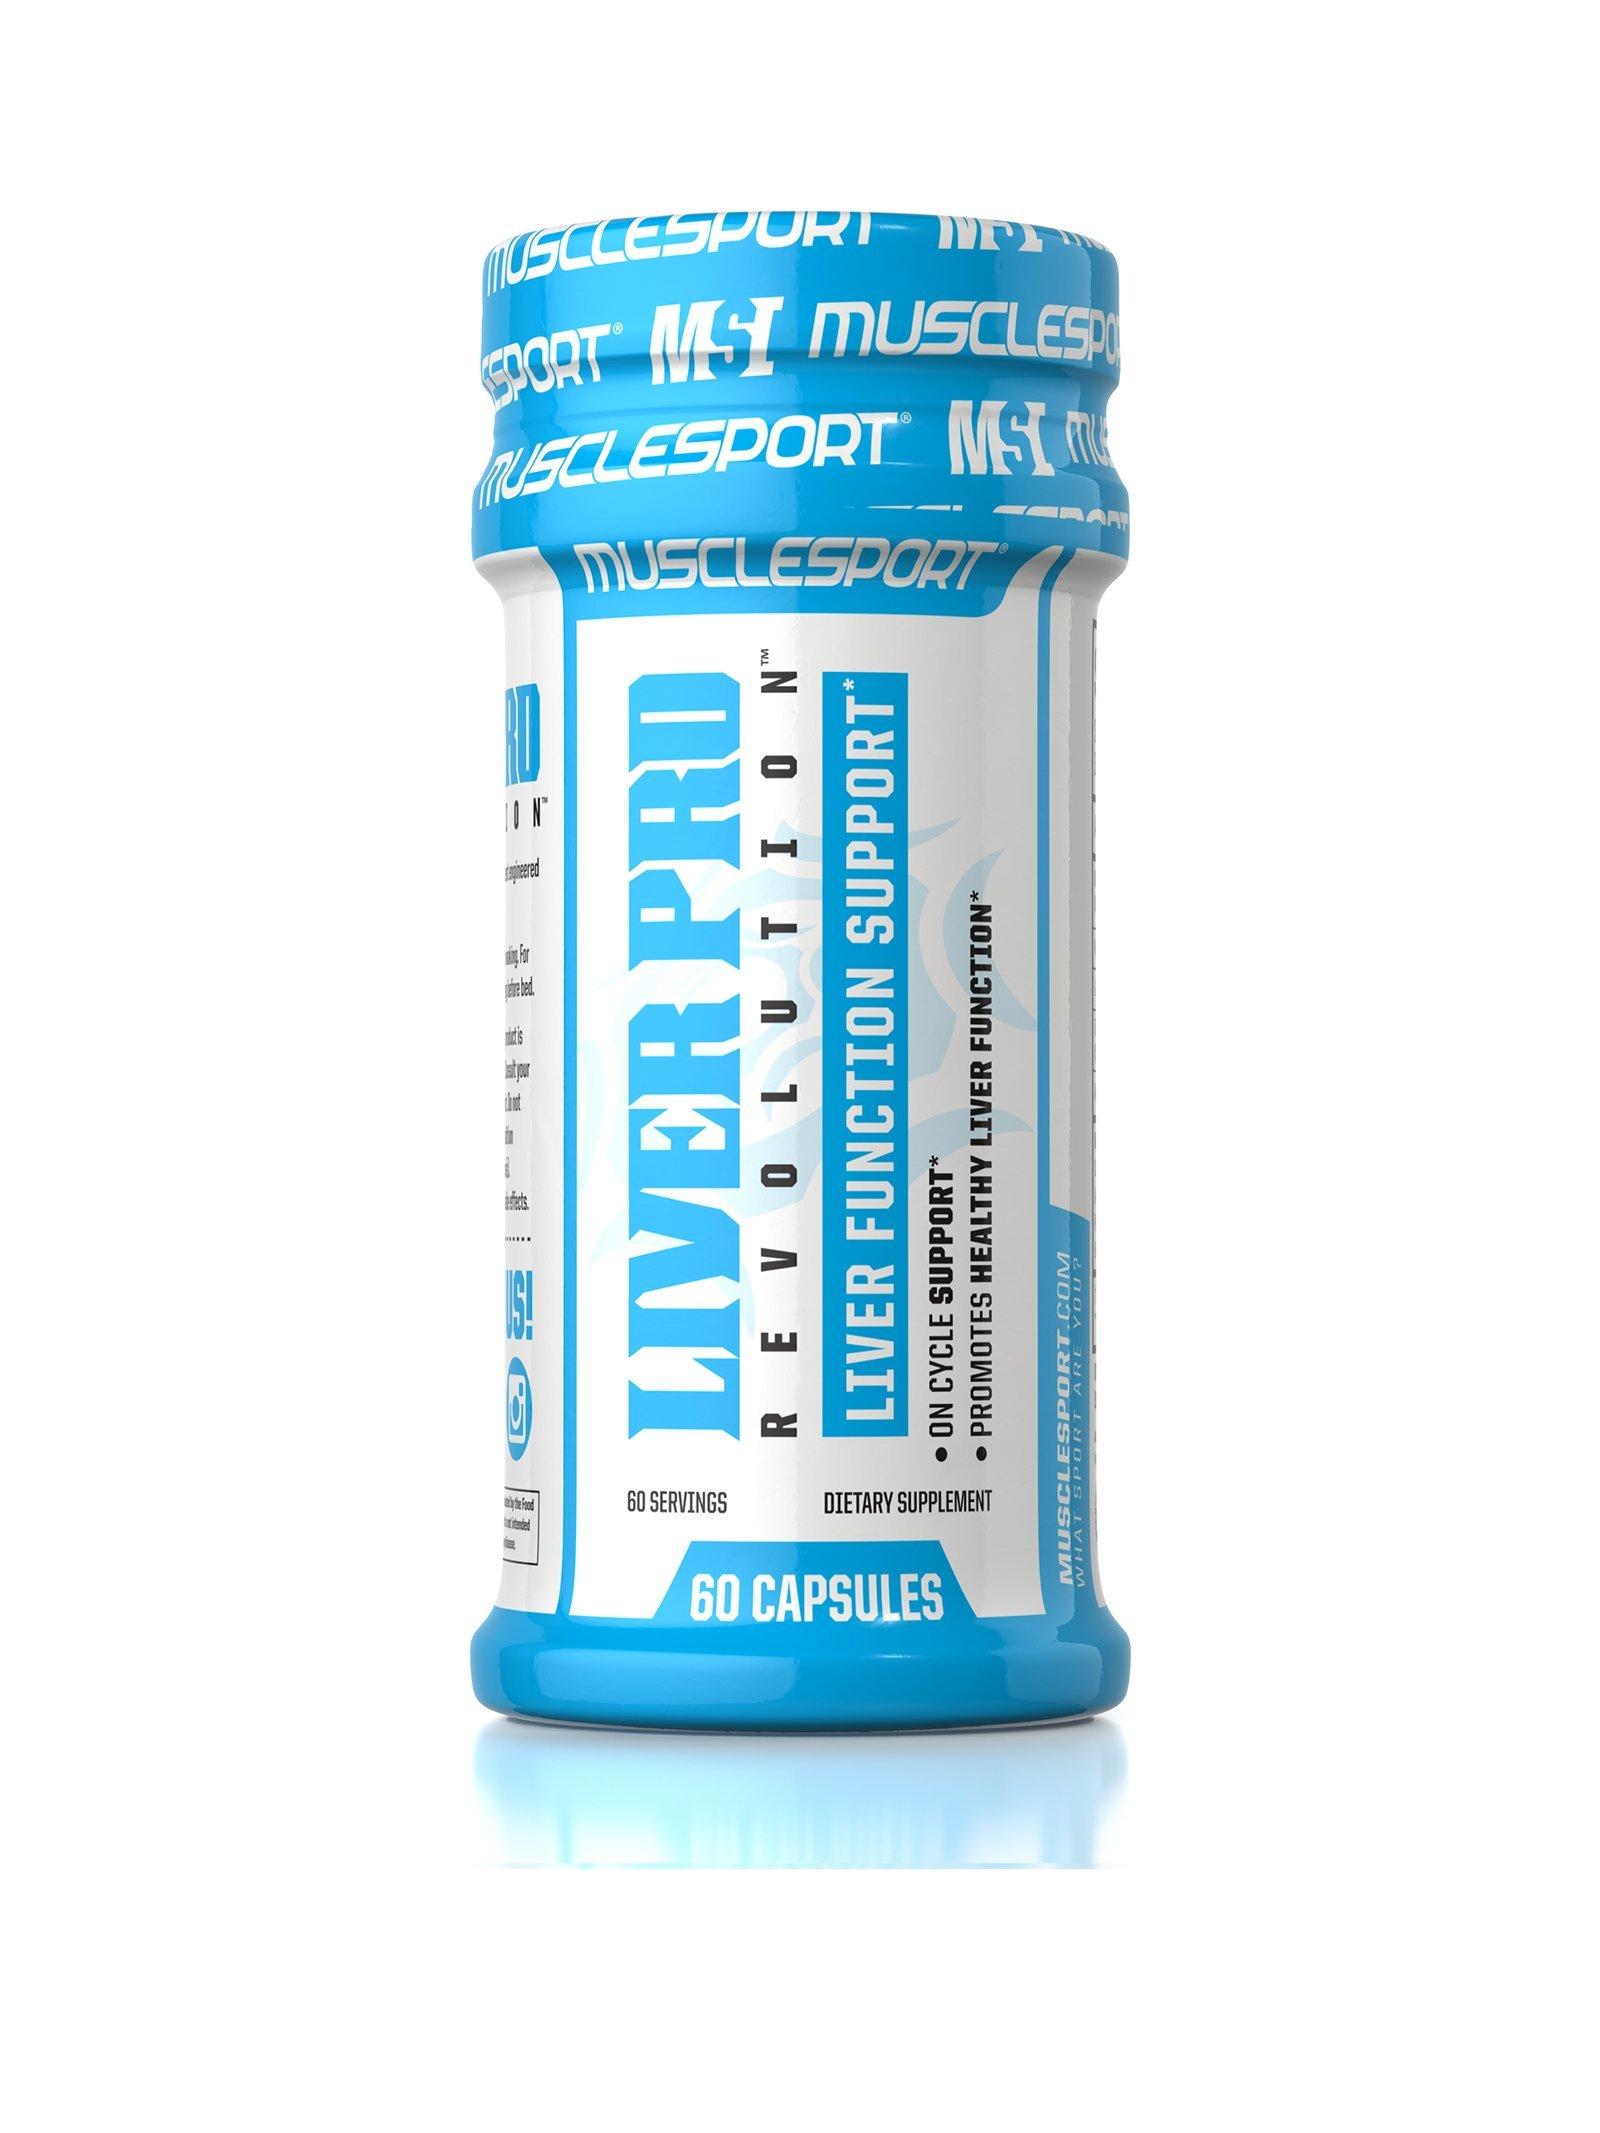 Musclesport Liver Pro Revolution™ 60 Capsules, Liver Detox & Regeneration System